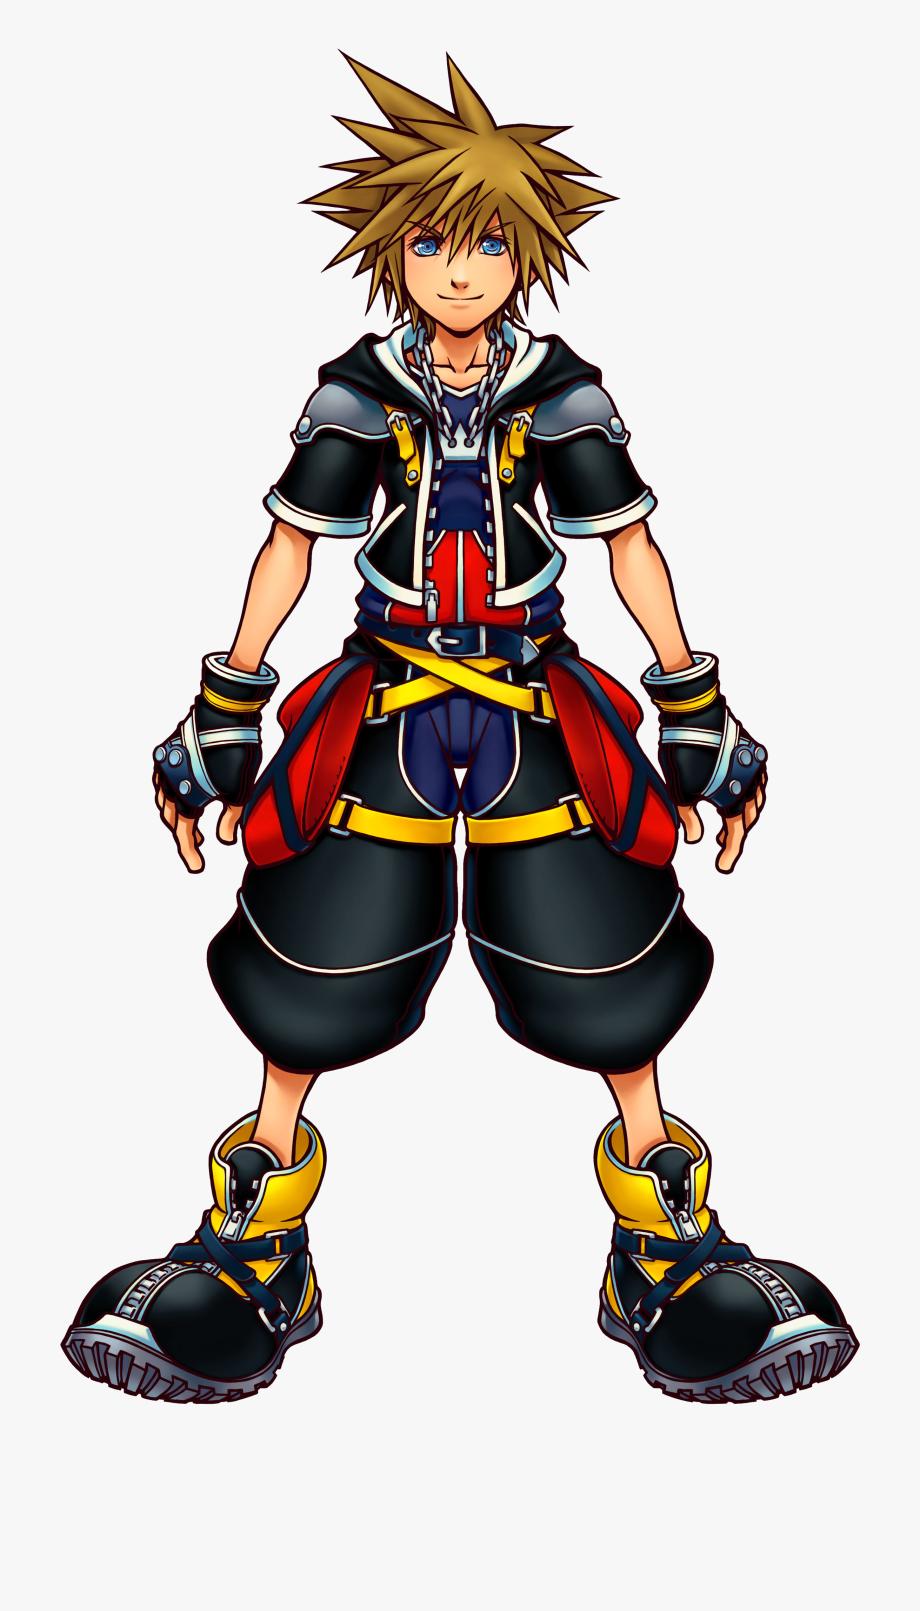 Kingdom hearts sora clipart banner free download Ye Olde Kingdom Hearts Fansite - Kingdom Hearts 2 Sora Artwork ... banner free download